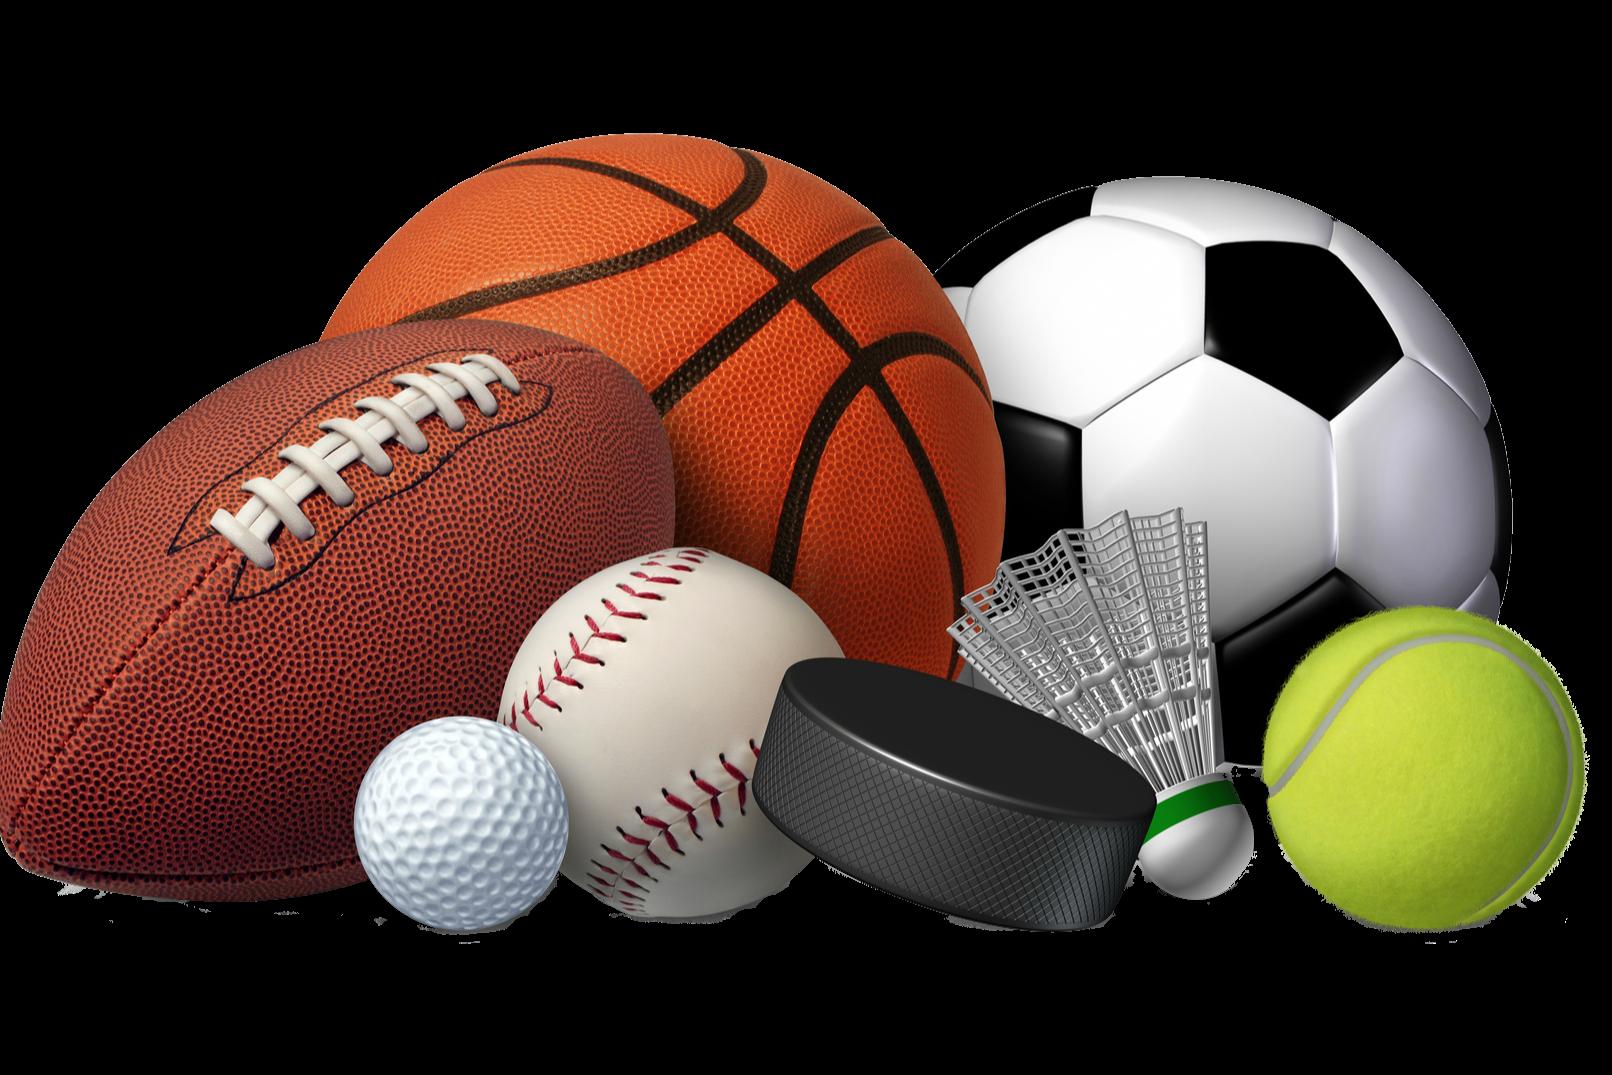 Football, Baseball, Basketball, Hockey Puck, Golf Ball, Badminton, Tennis Ball, Soccer ball